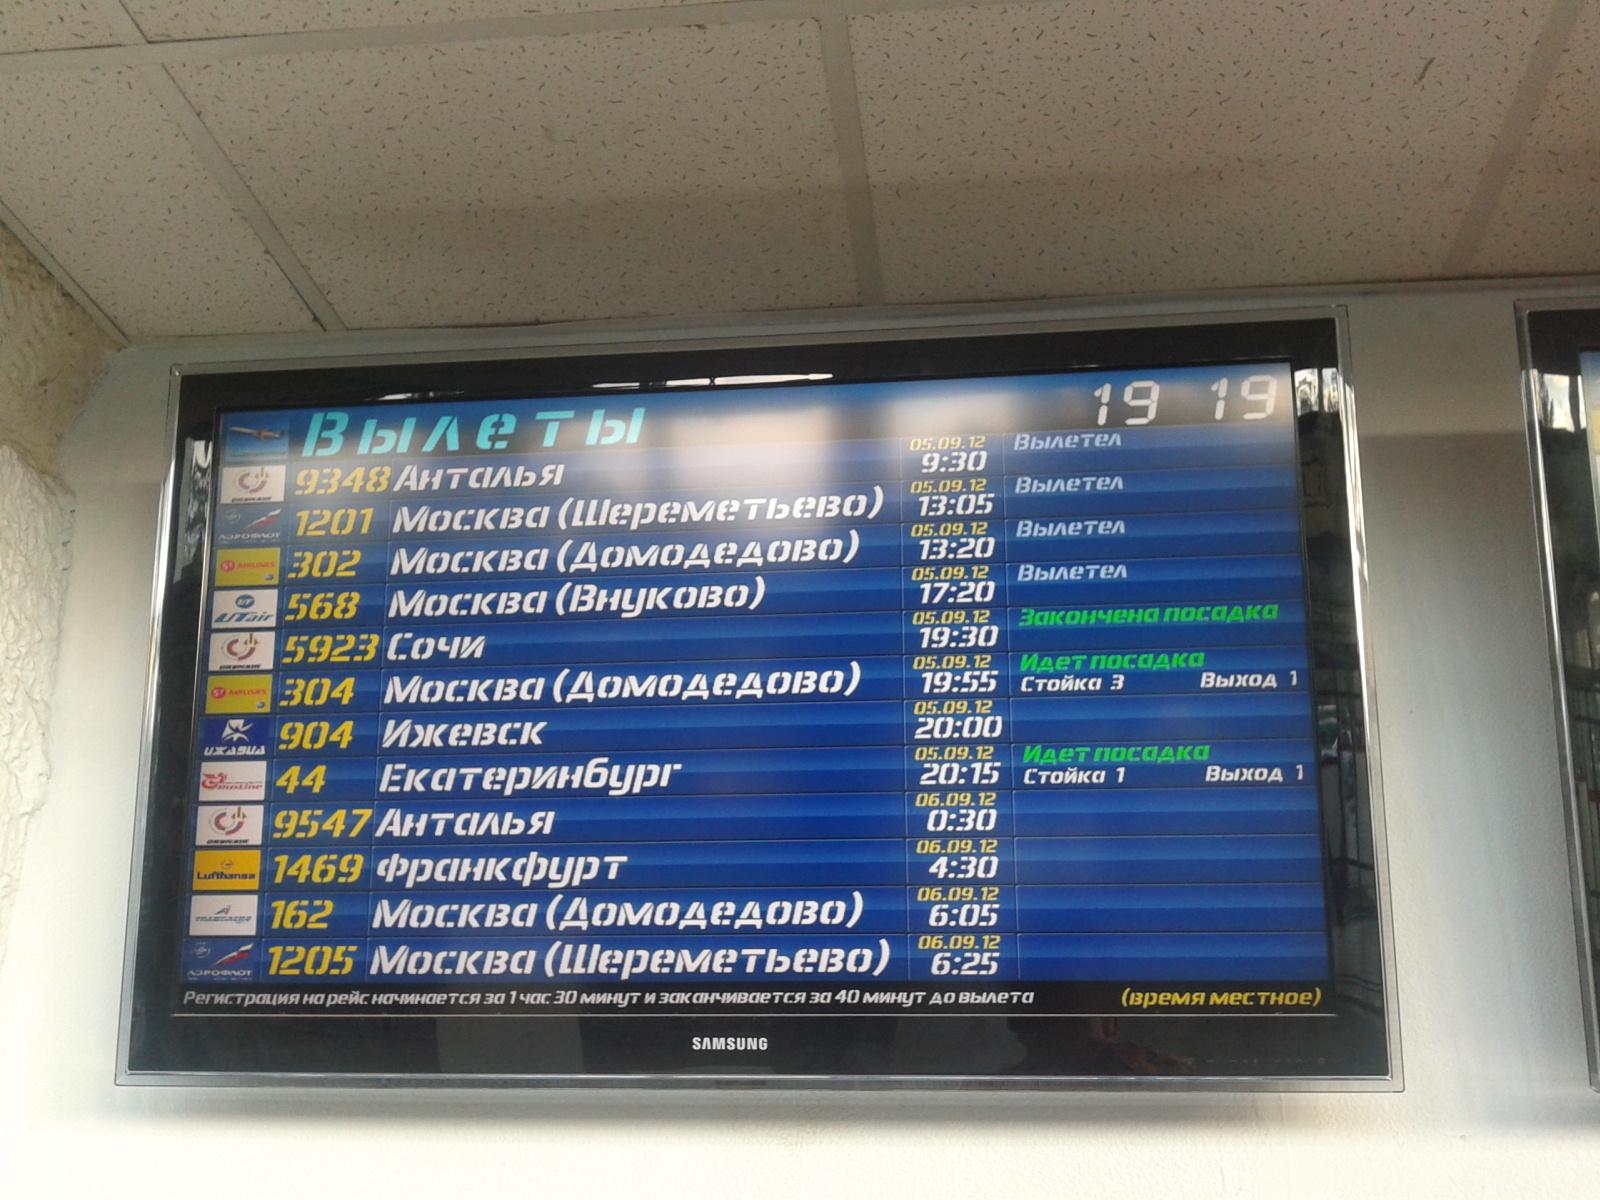 Табло аэропорта Большое Савино